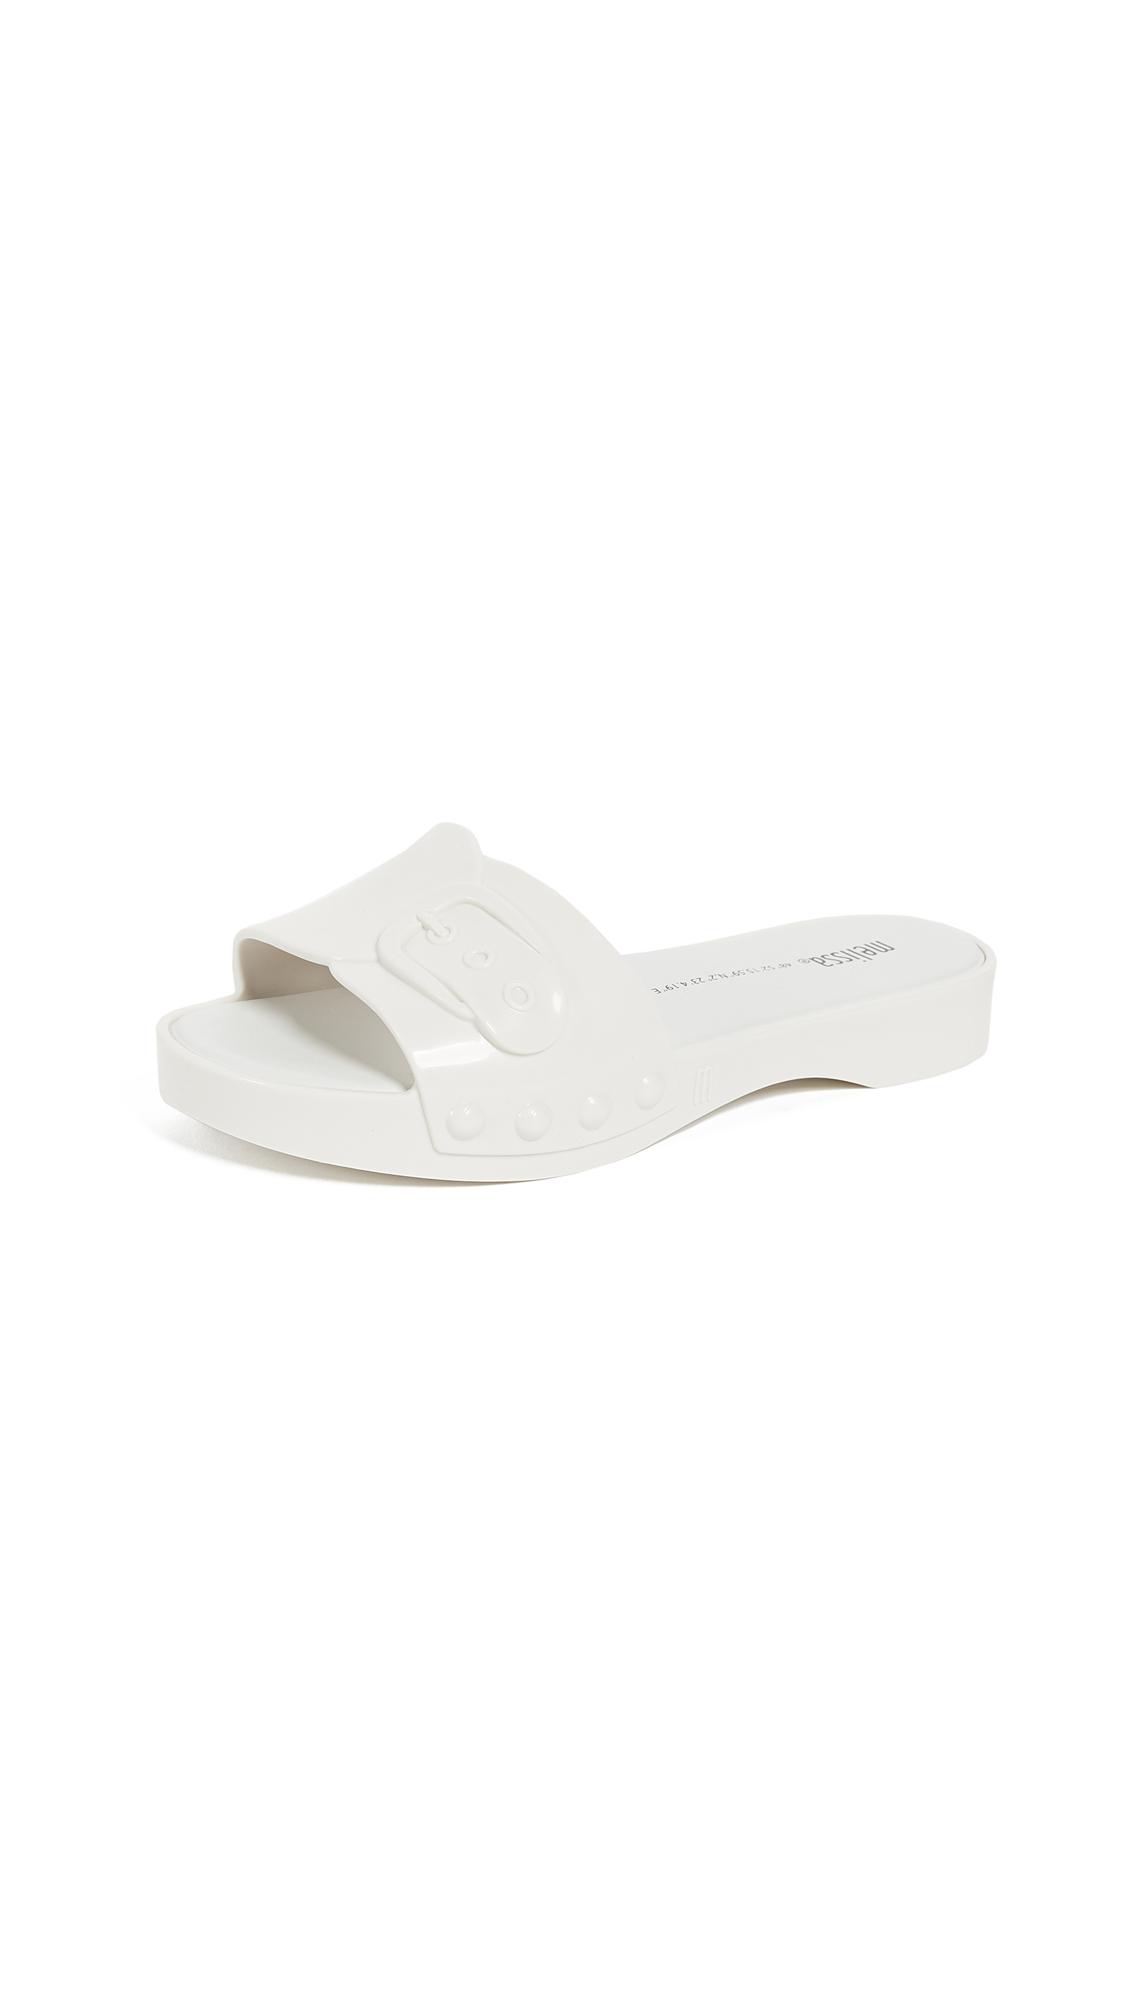 Melissa Belleville Slides - White